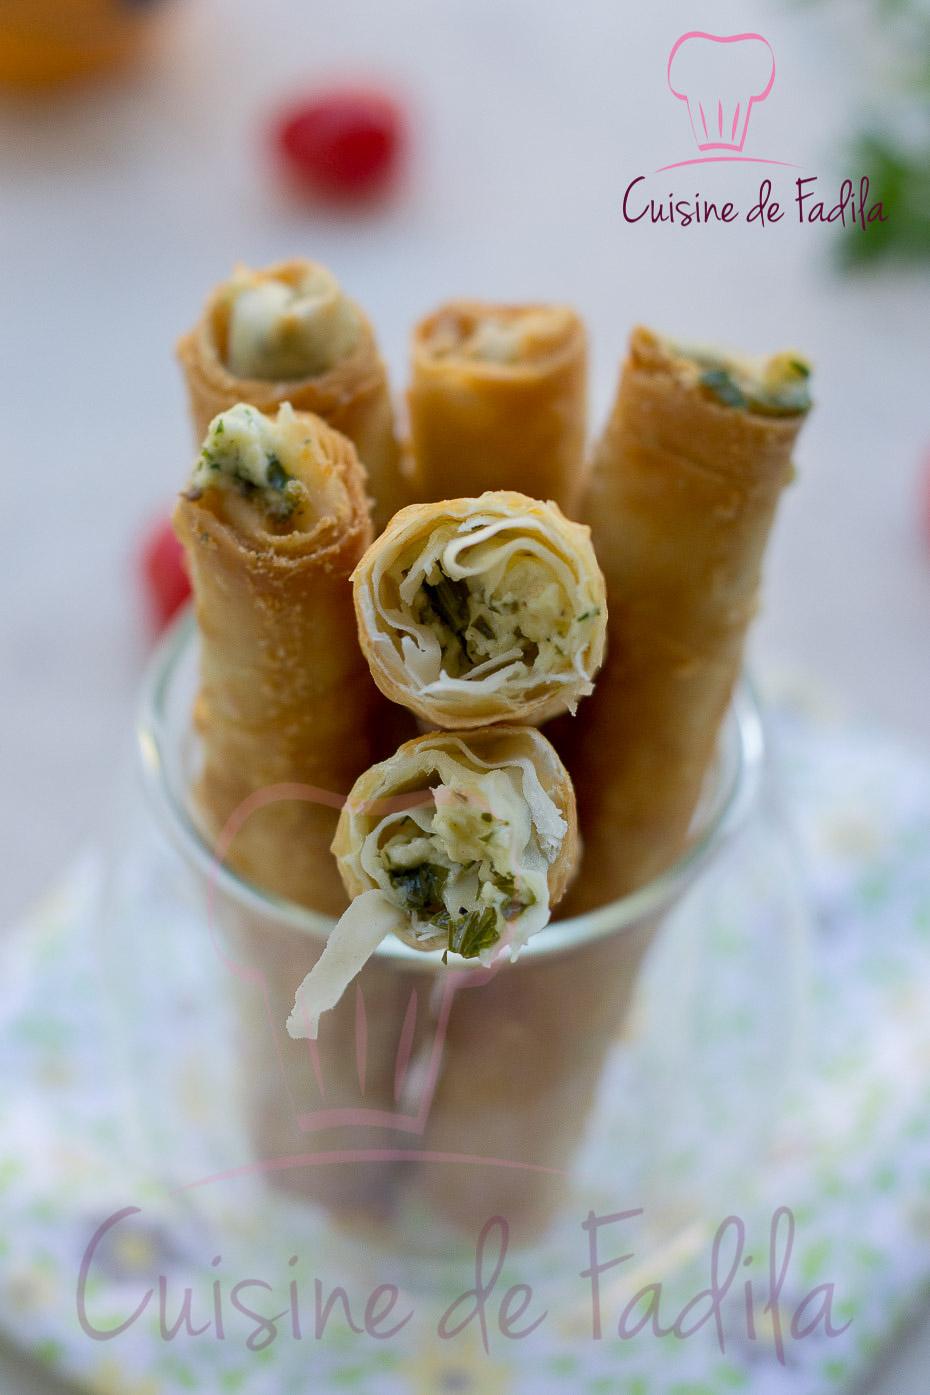 Sigara b re i ou cigare au fromage recette en vid o cuisine de fadila - Recette de cuisine en video ...